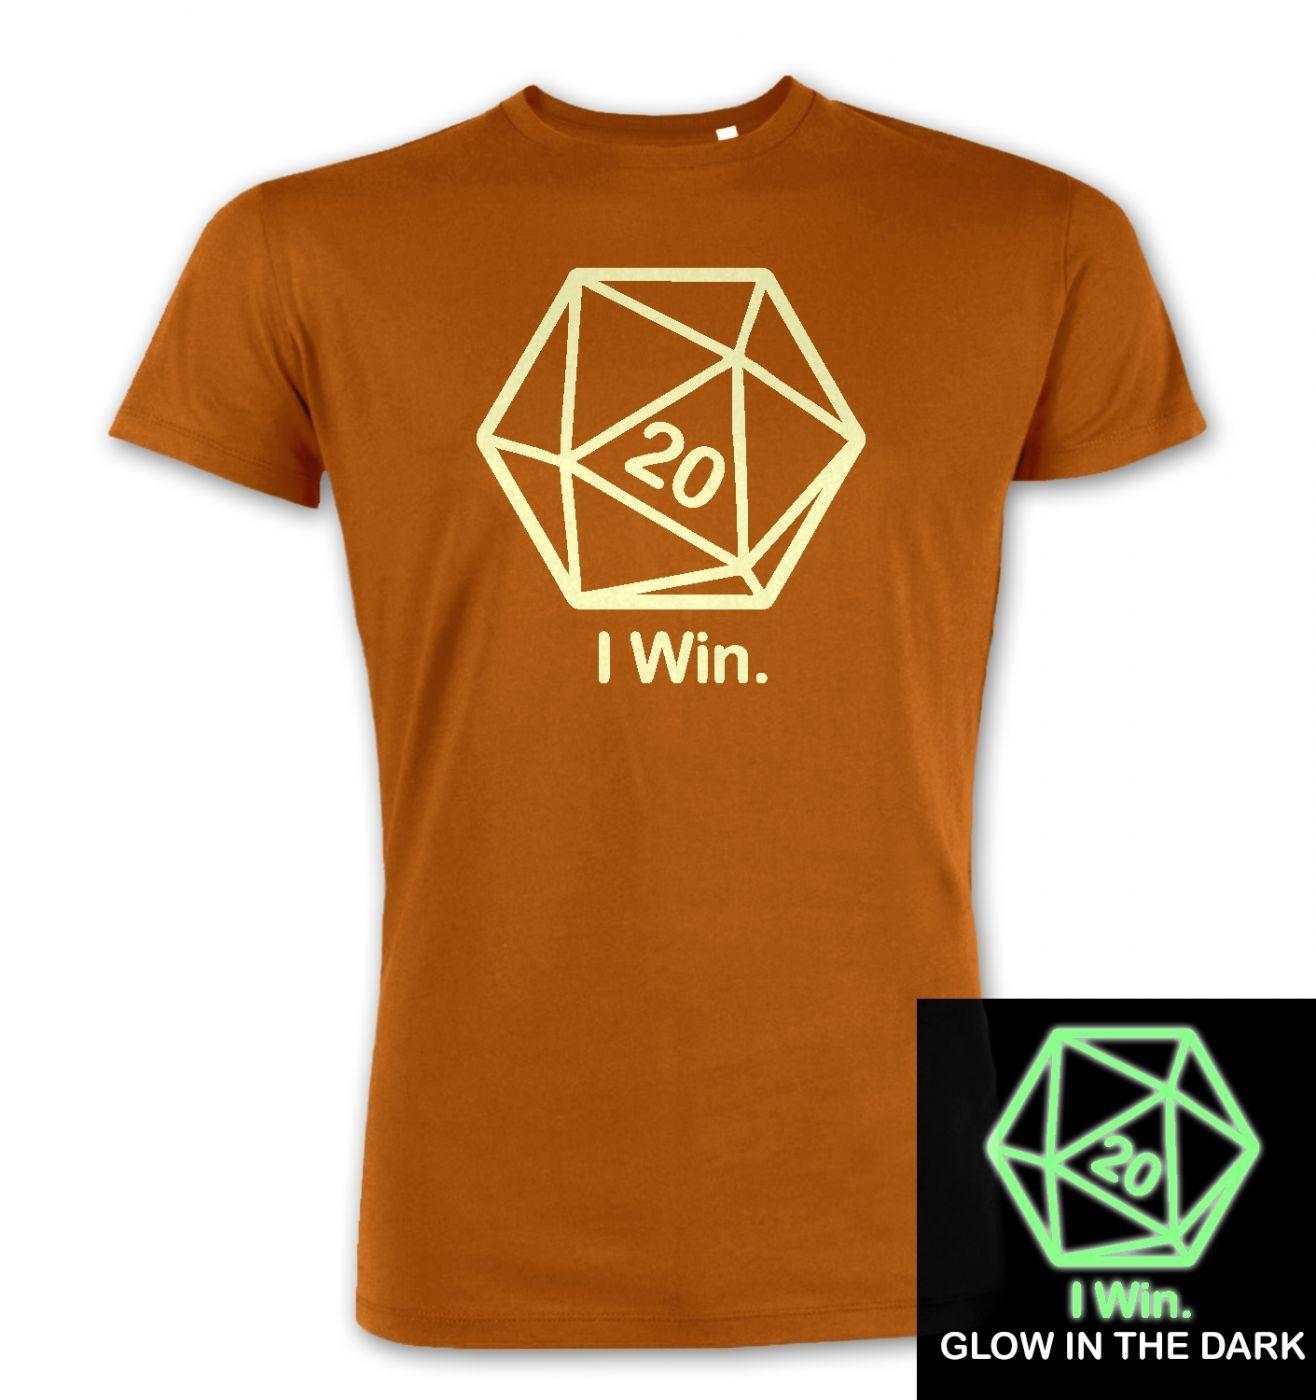 D20 I Win (glow in the dark) premium t-shirt